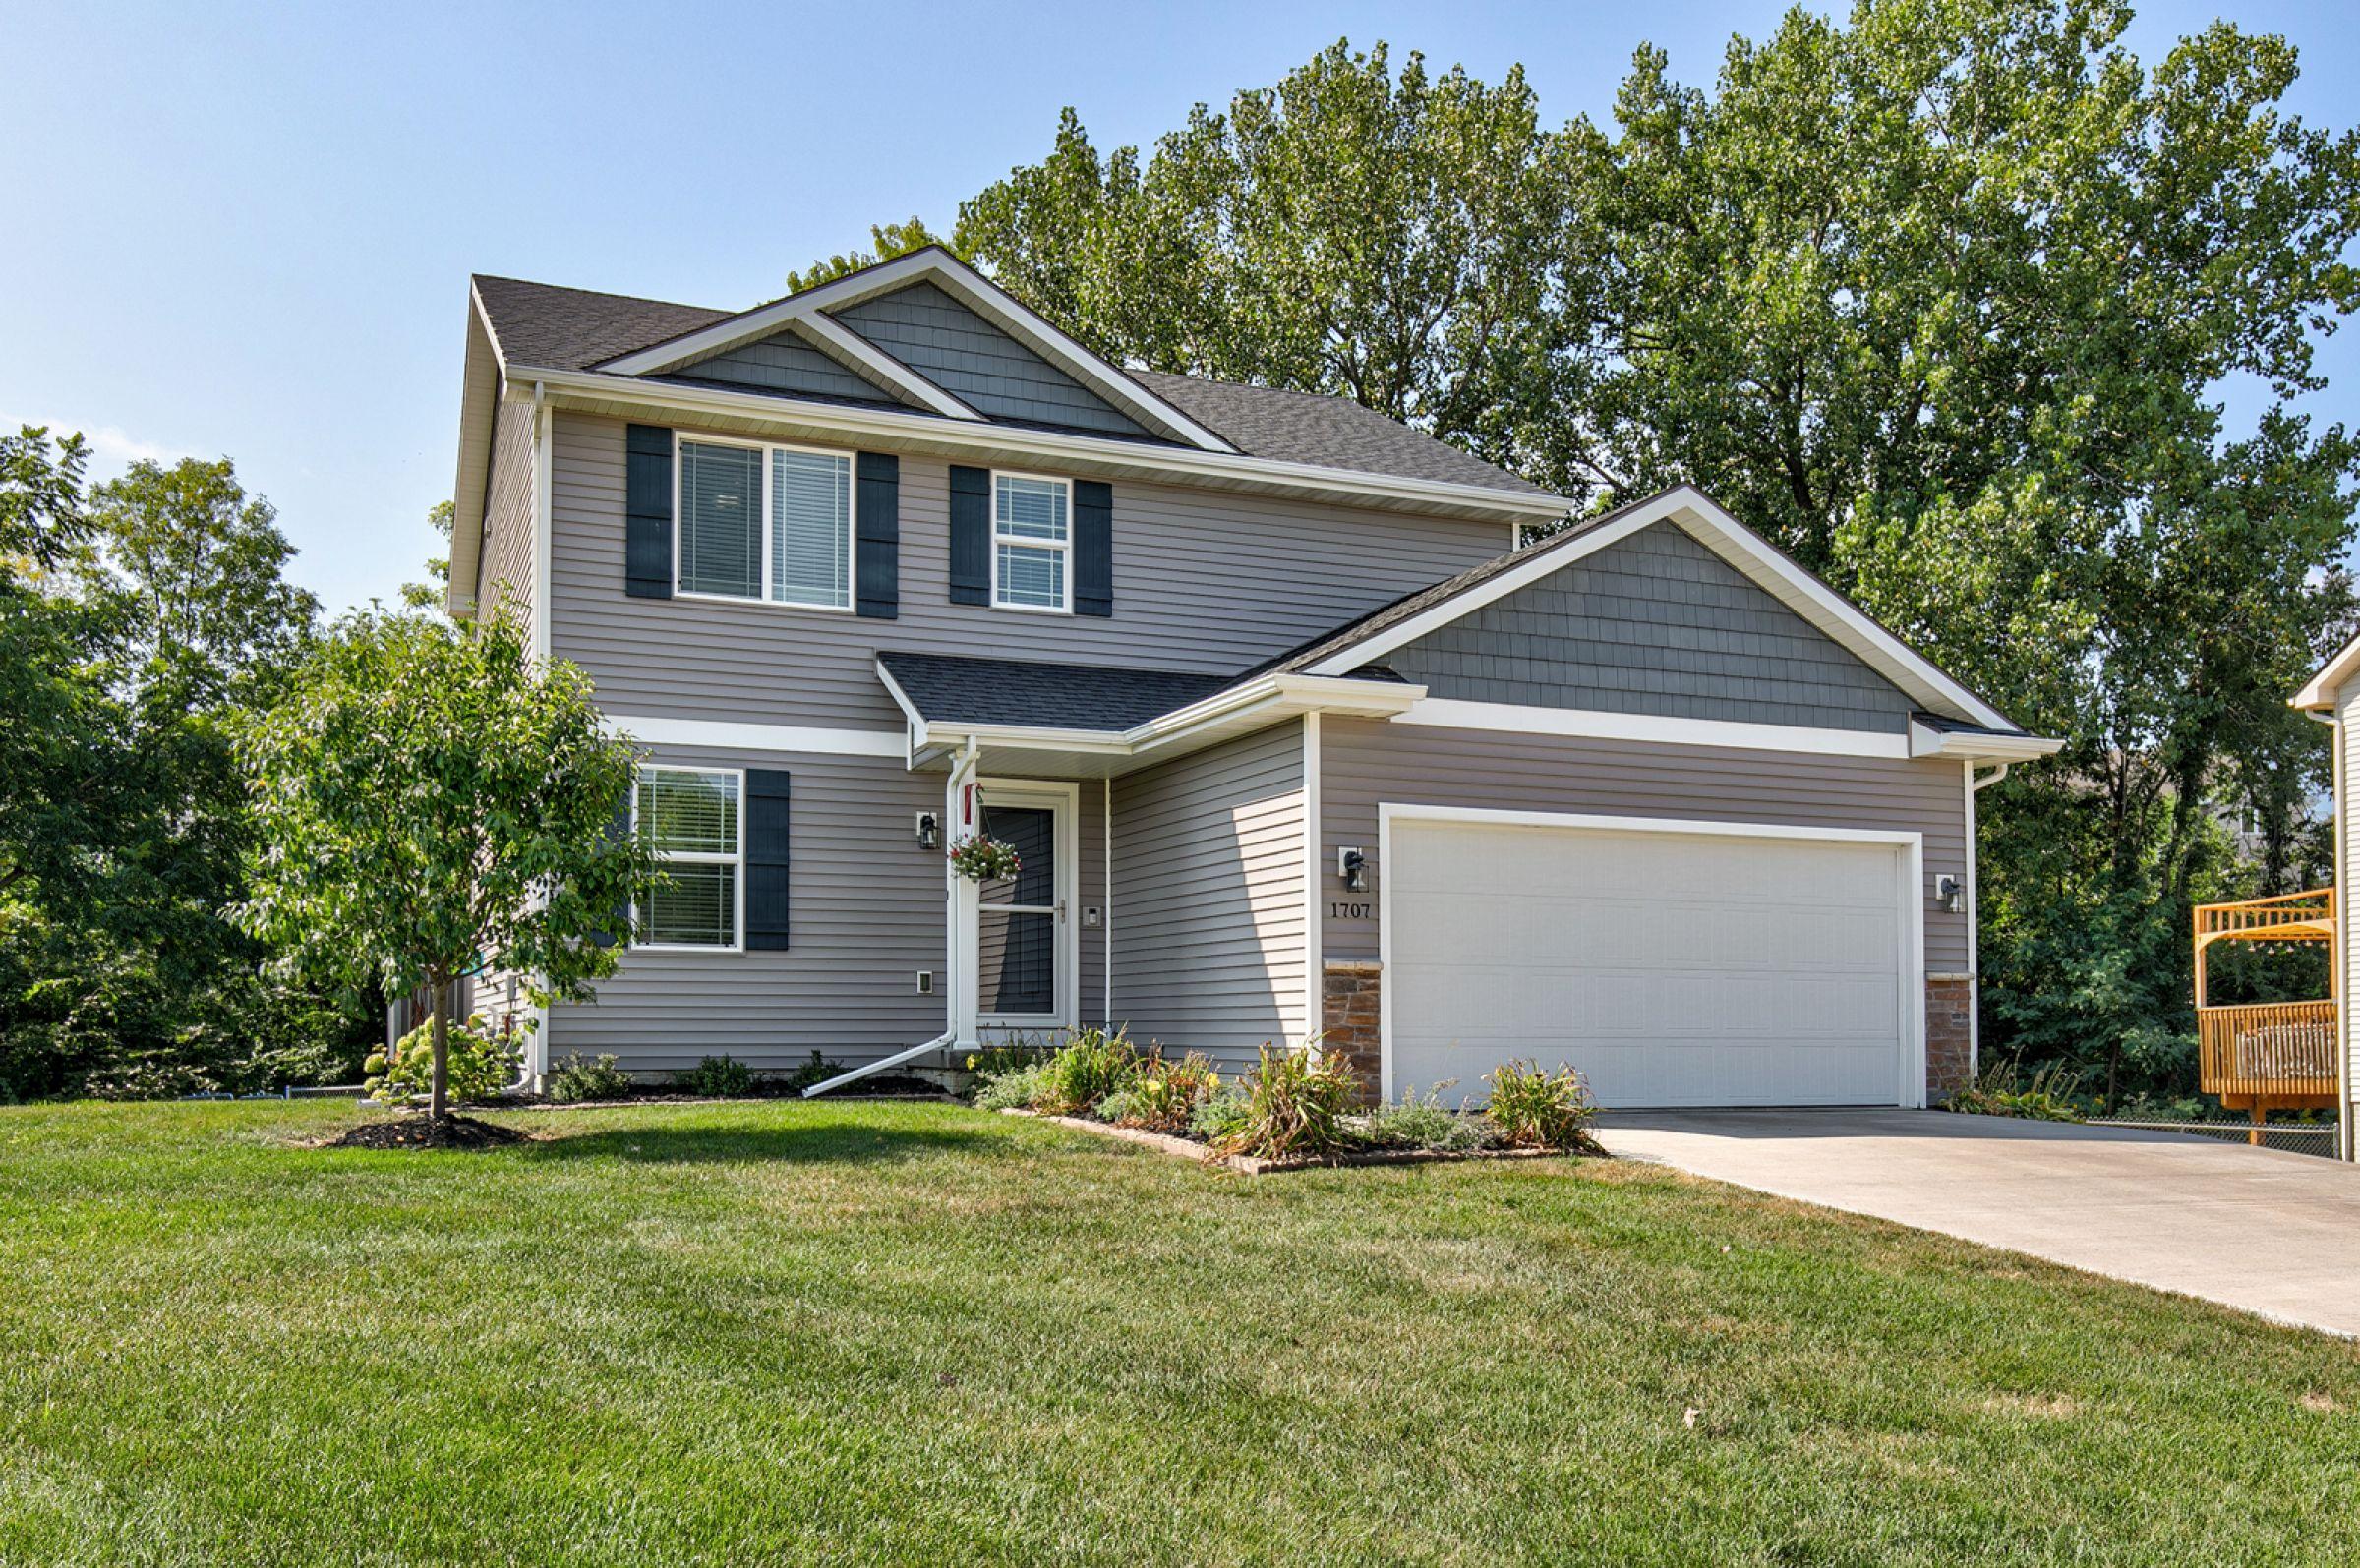 residential-warren-county-iowa-0-acres-listing-number-15685-0-2021-08-31-032154.jpg